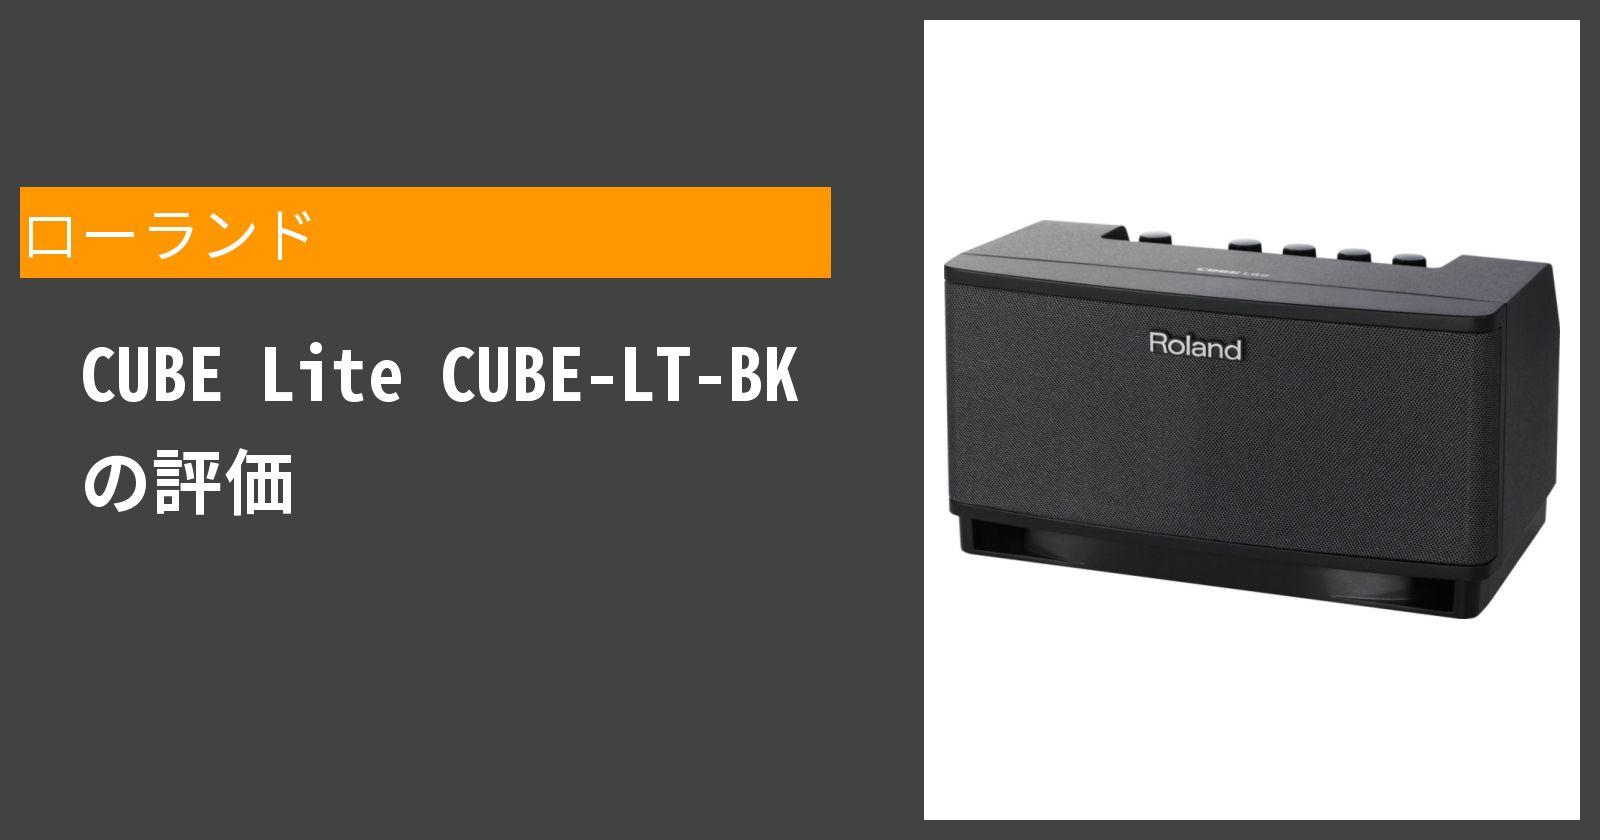 CUBE Lite CUBE-LT-BKを徹底評価